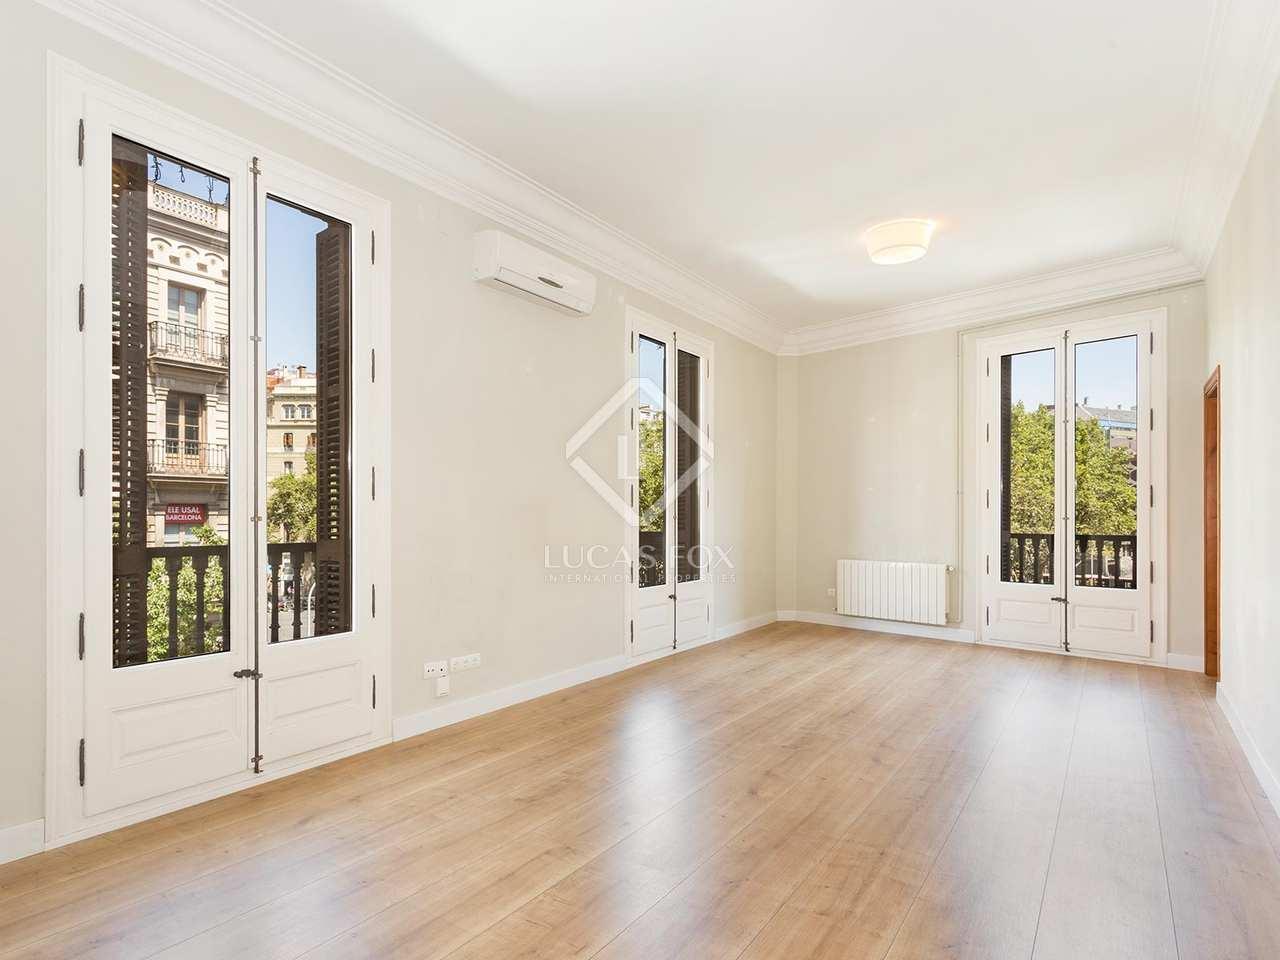 Appartement de 172m a vendre g tico barcelone for Appartement avec piscine barcelone